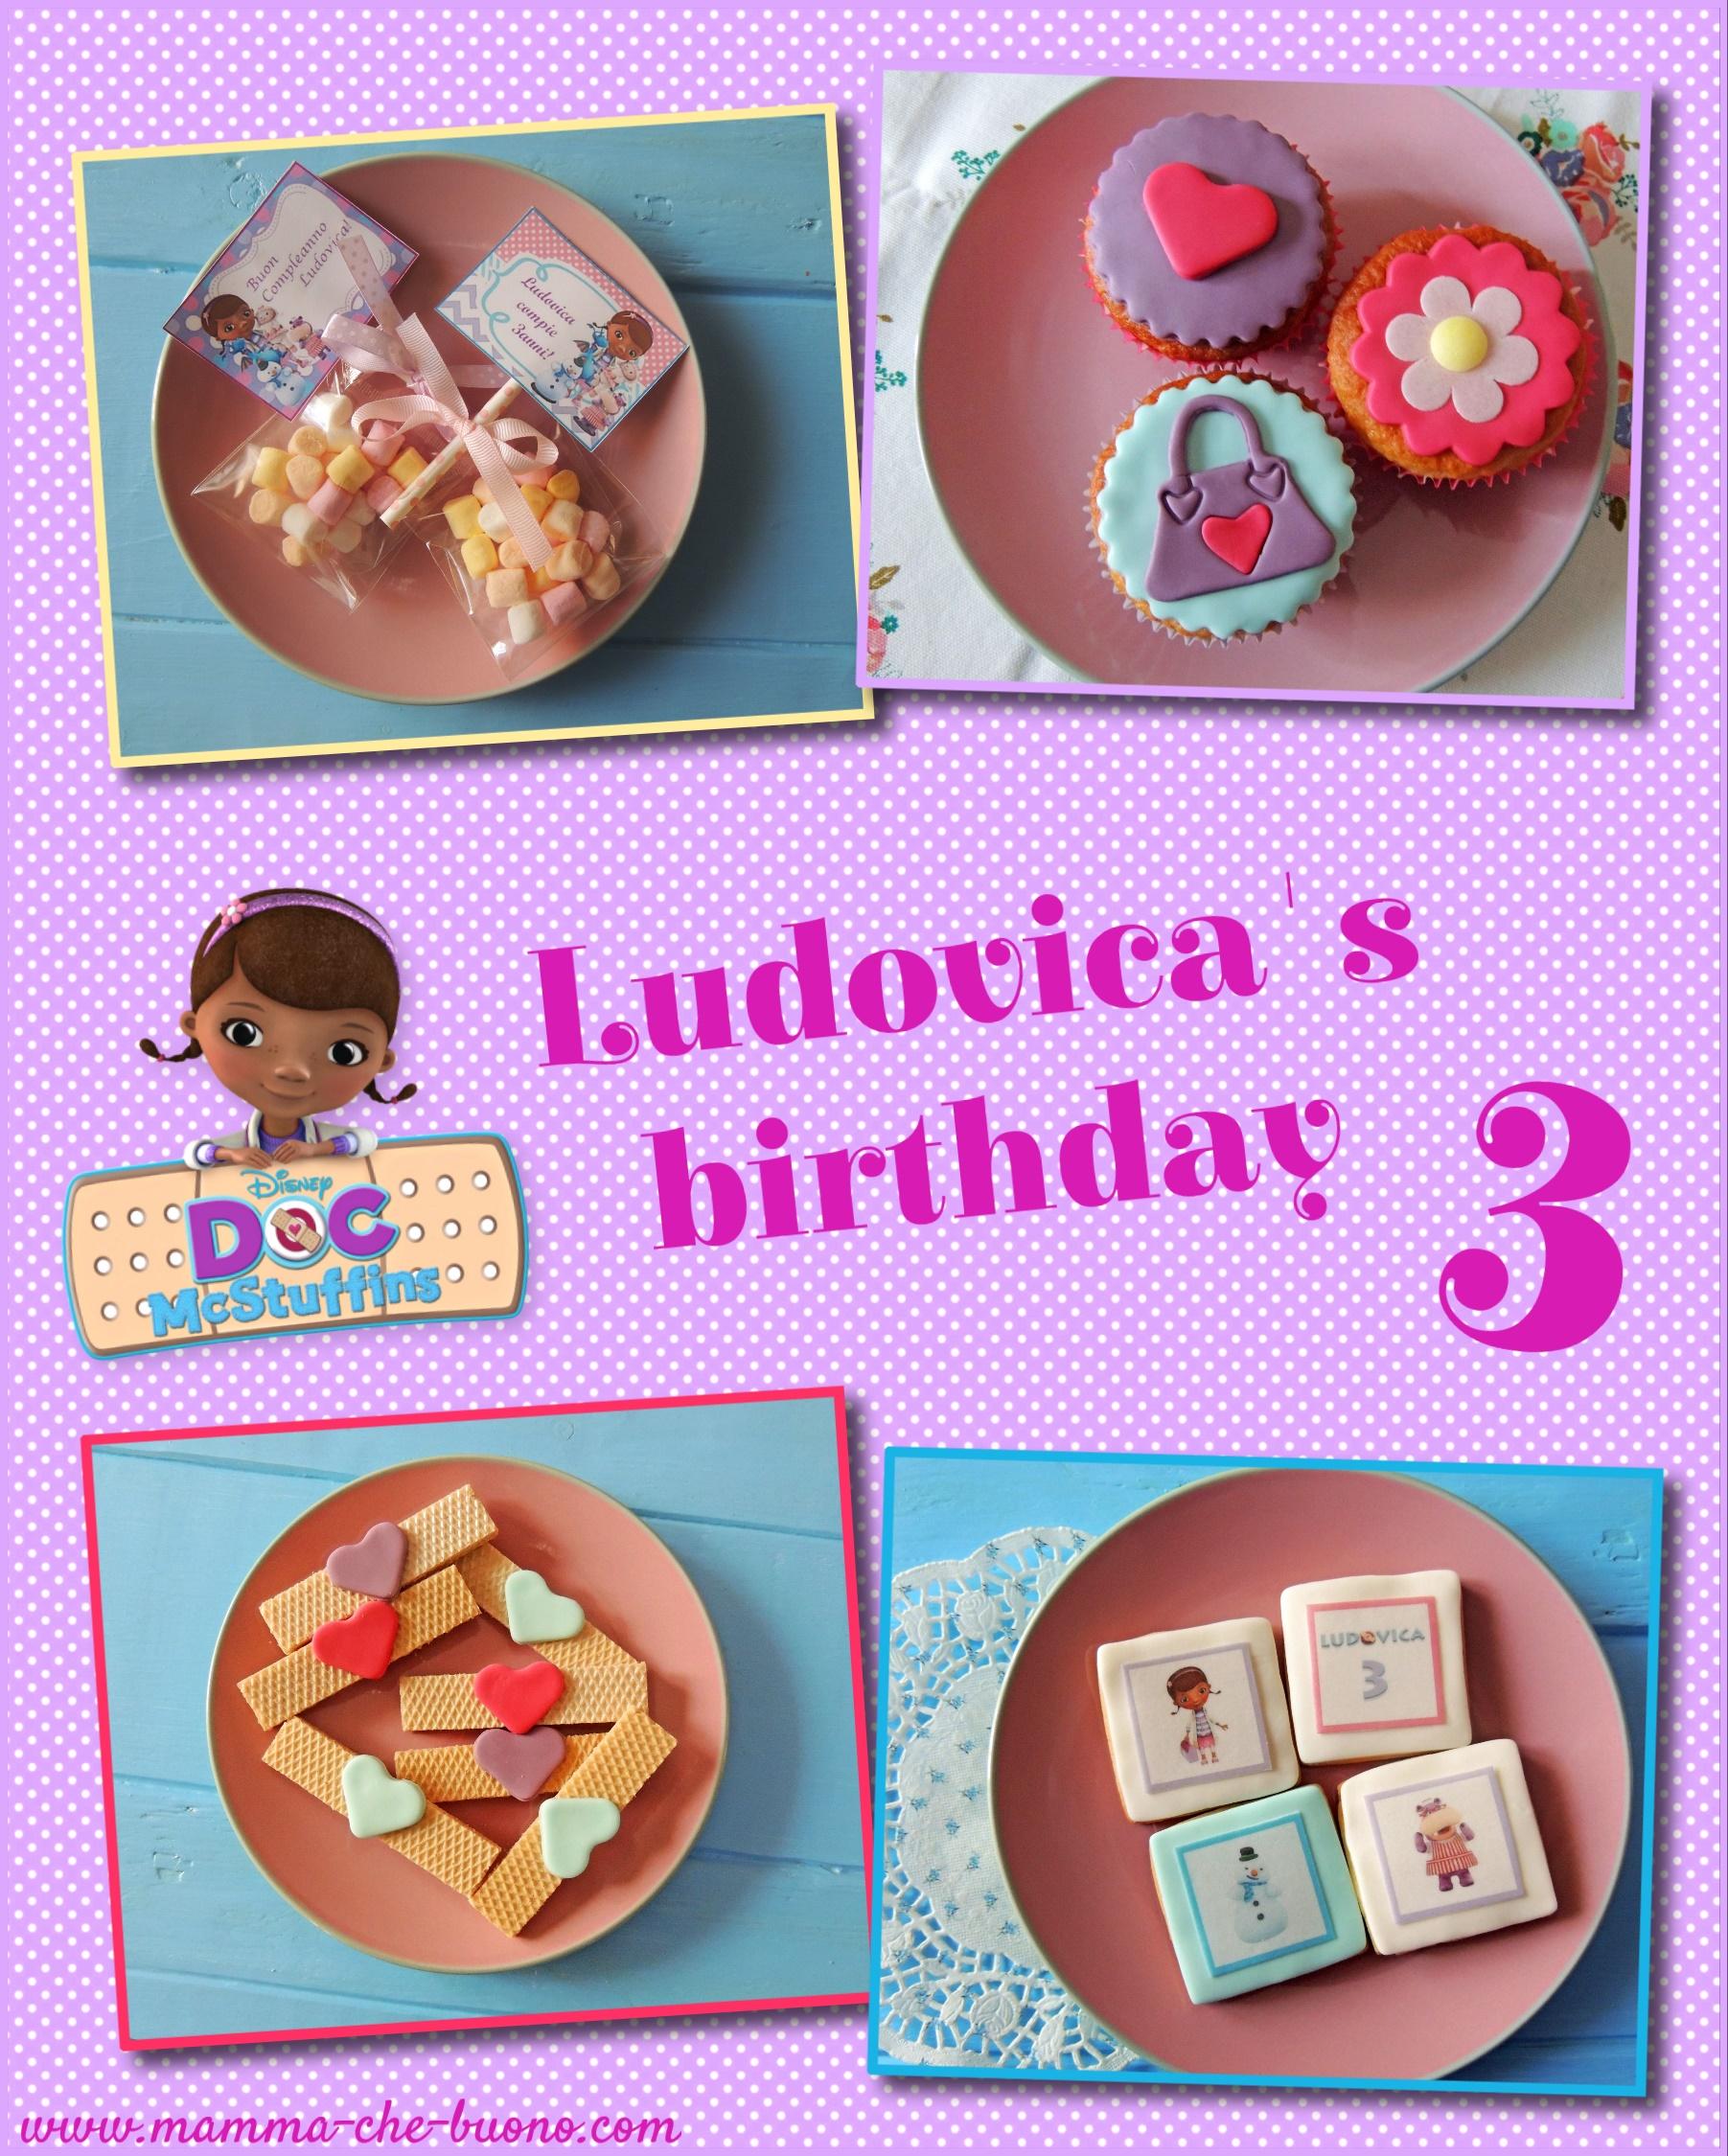 ludovica birthday 3.jpg